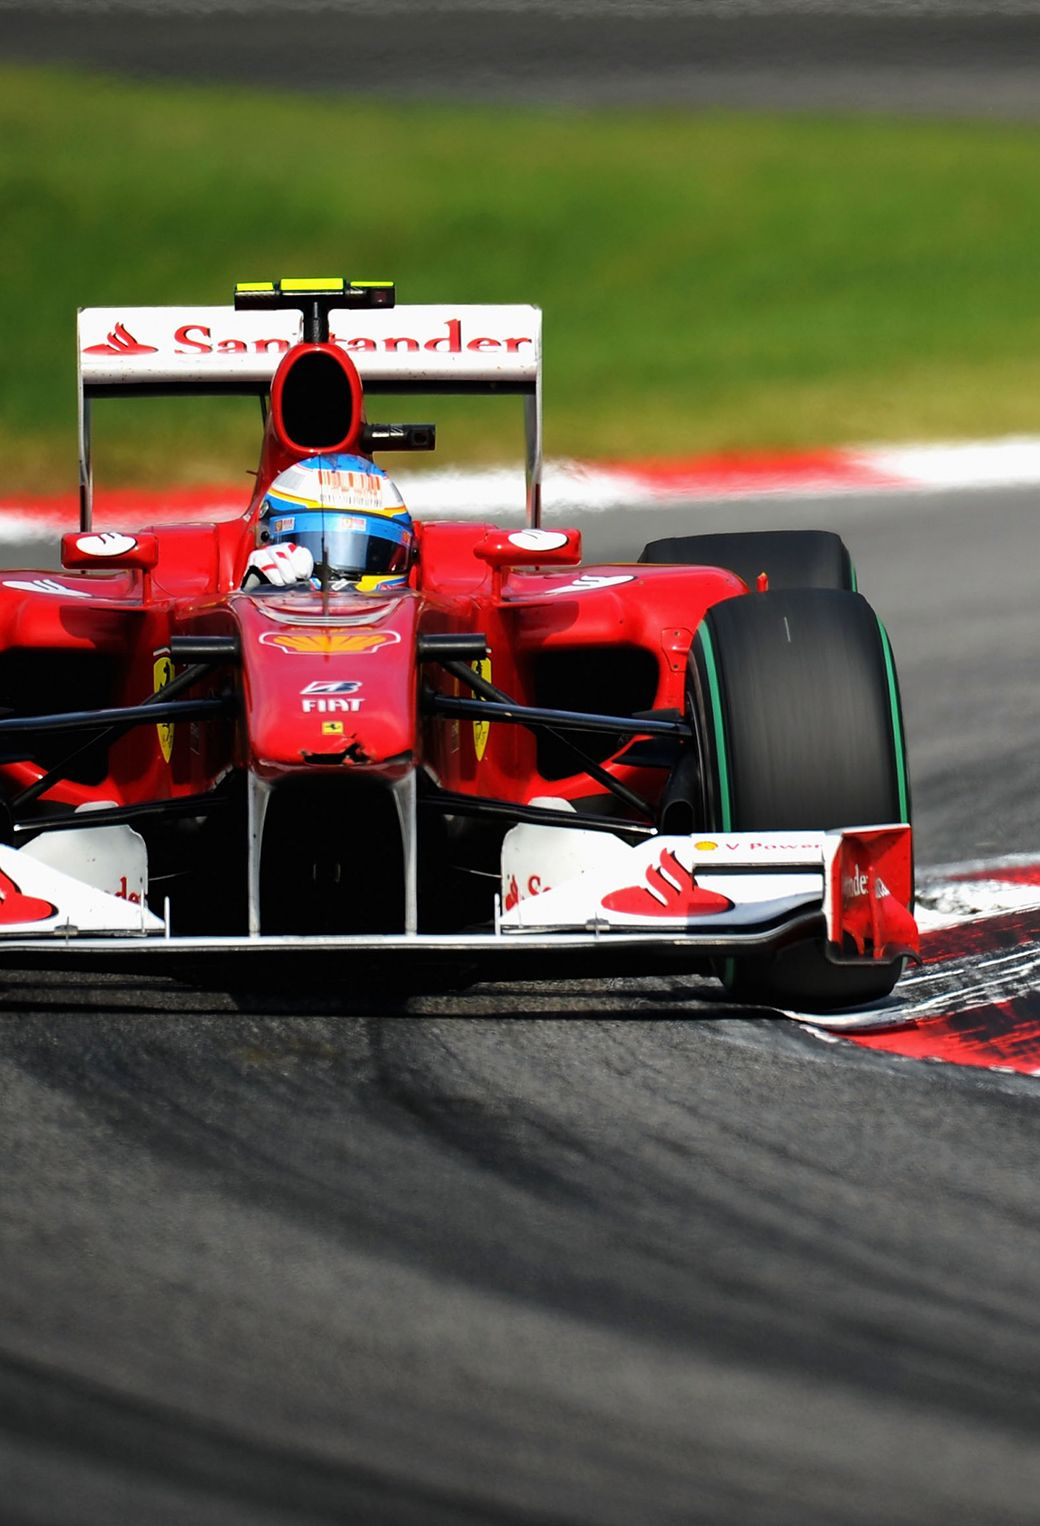 50+ Ferrari F1 Iphone Wallpaper  Background